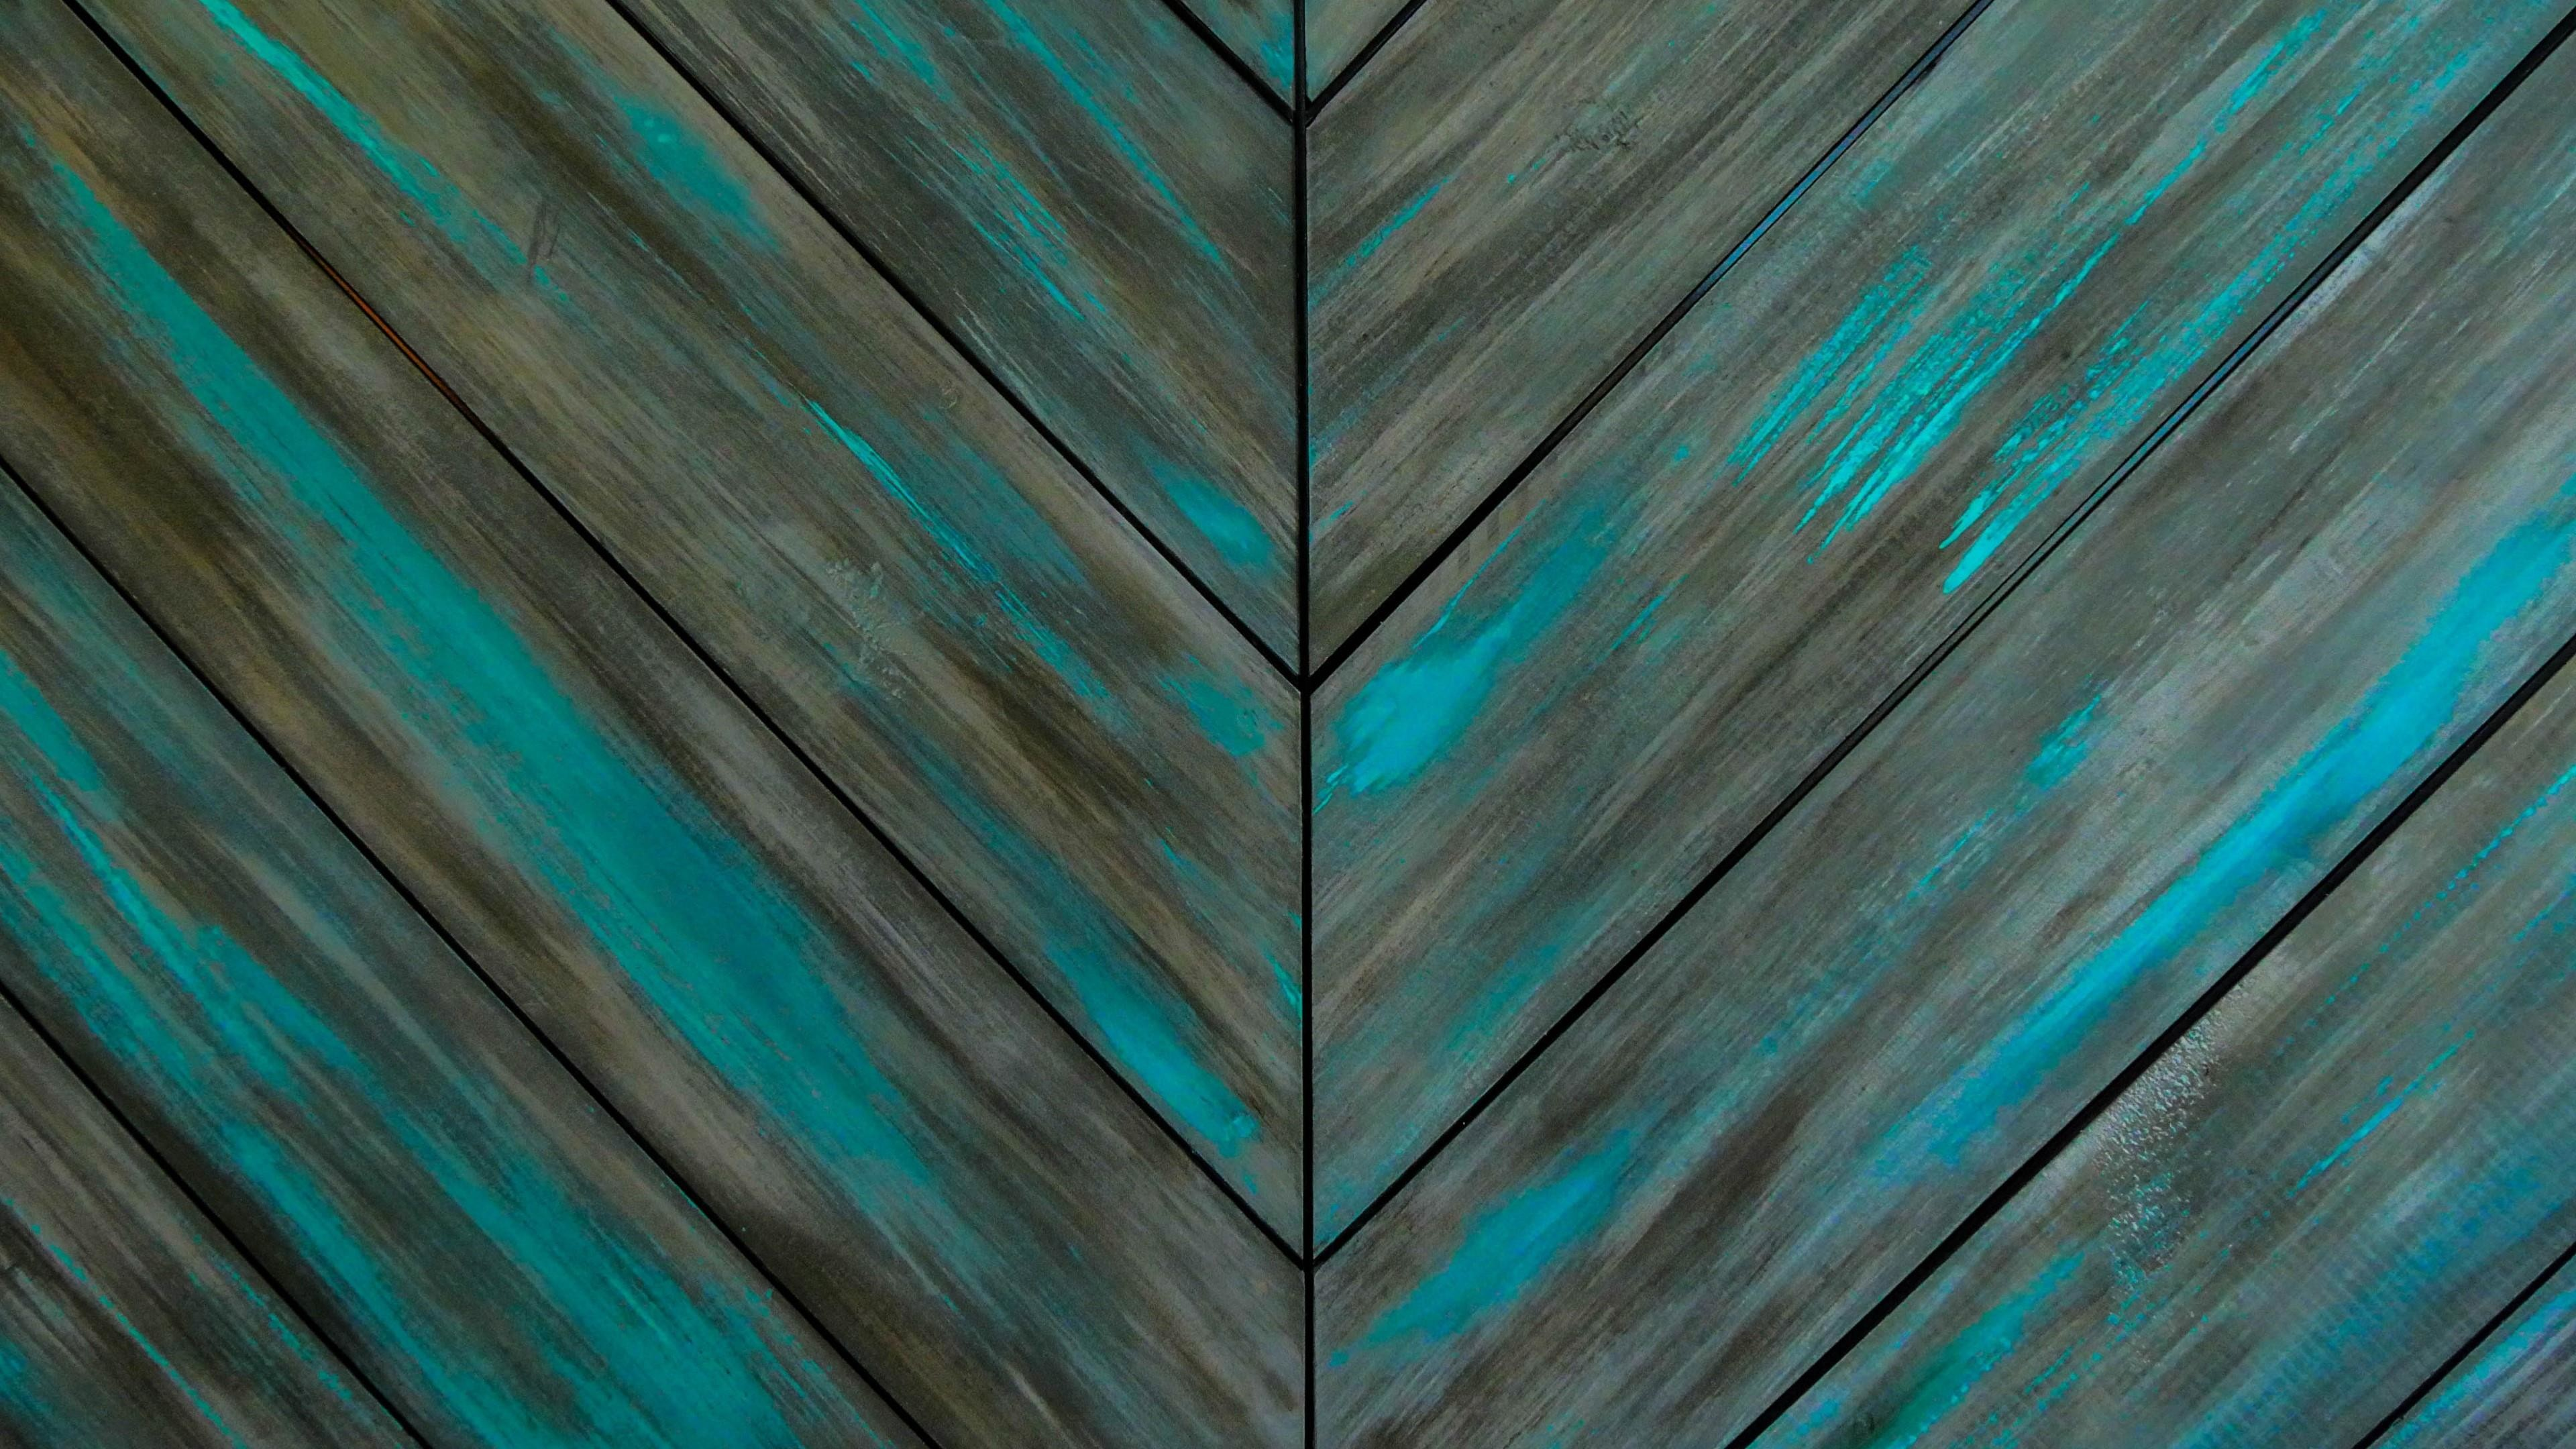 3840x2160, Turquoise Wood Wall - Dark Teal Wood Background - HD Wallpaper